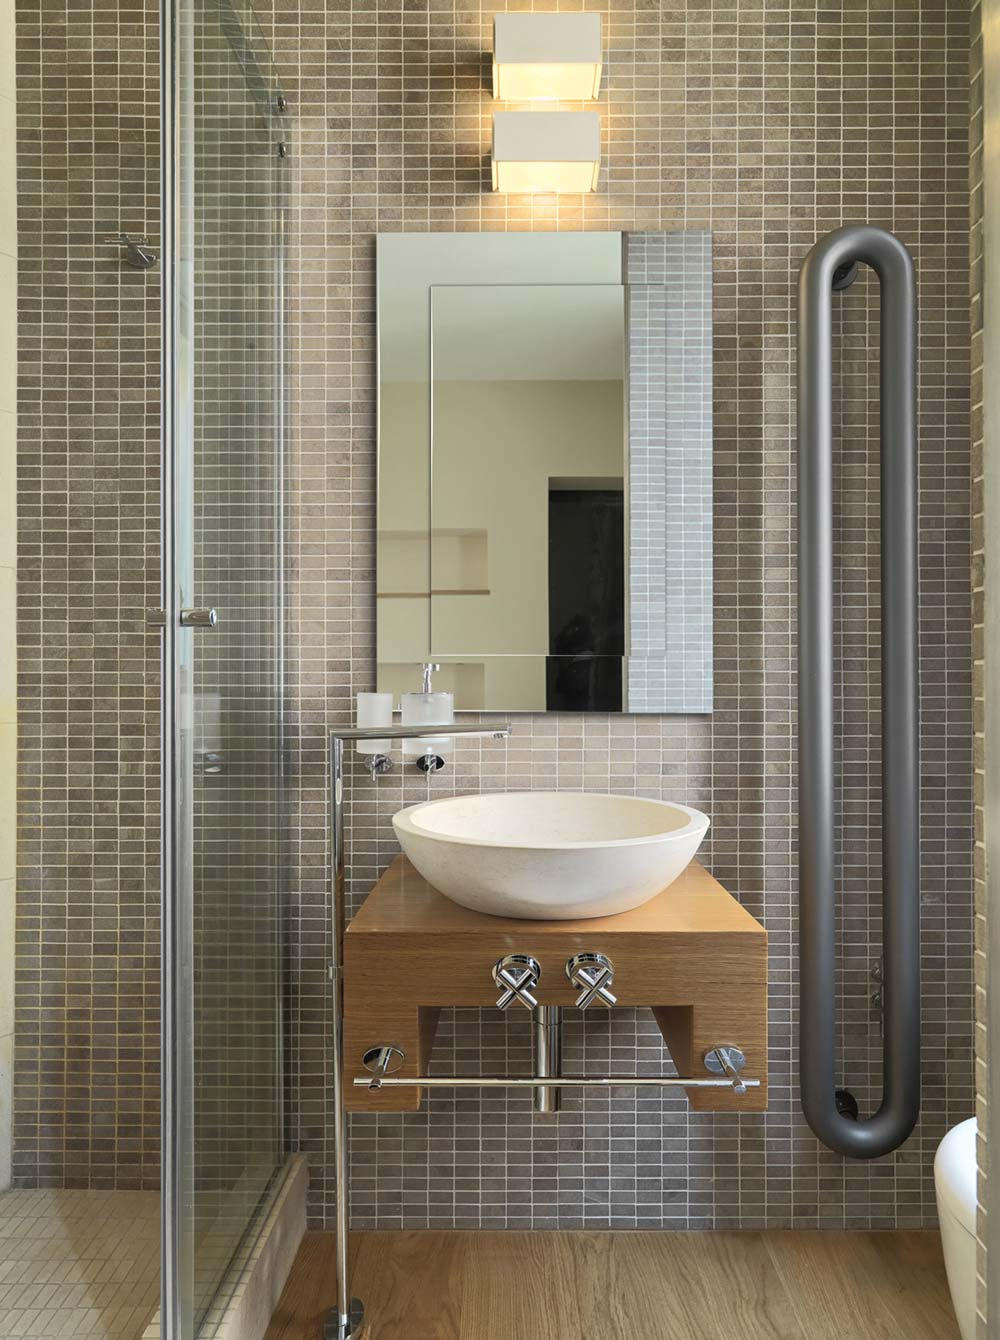 Обустройство ванной комнаты с помощью зеркала Modern SQ от GieraDesign.